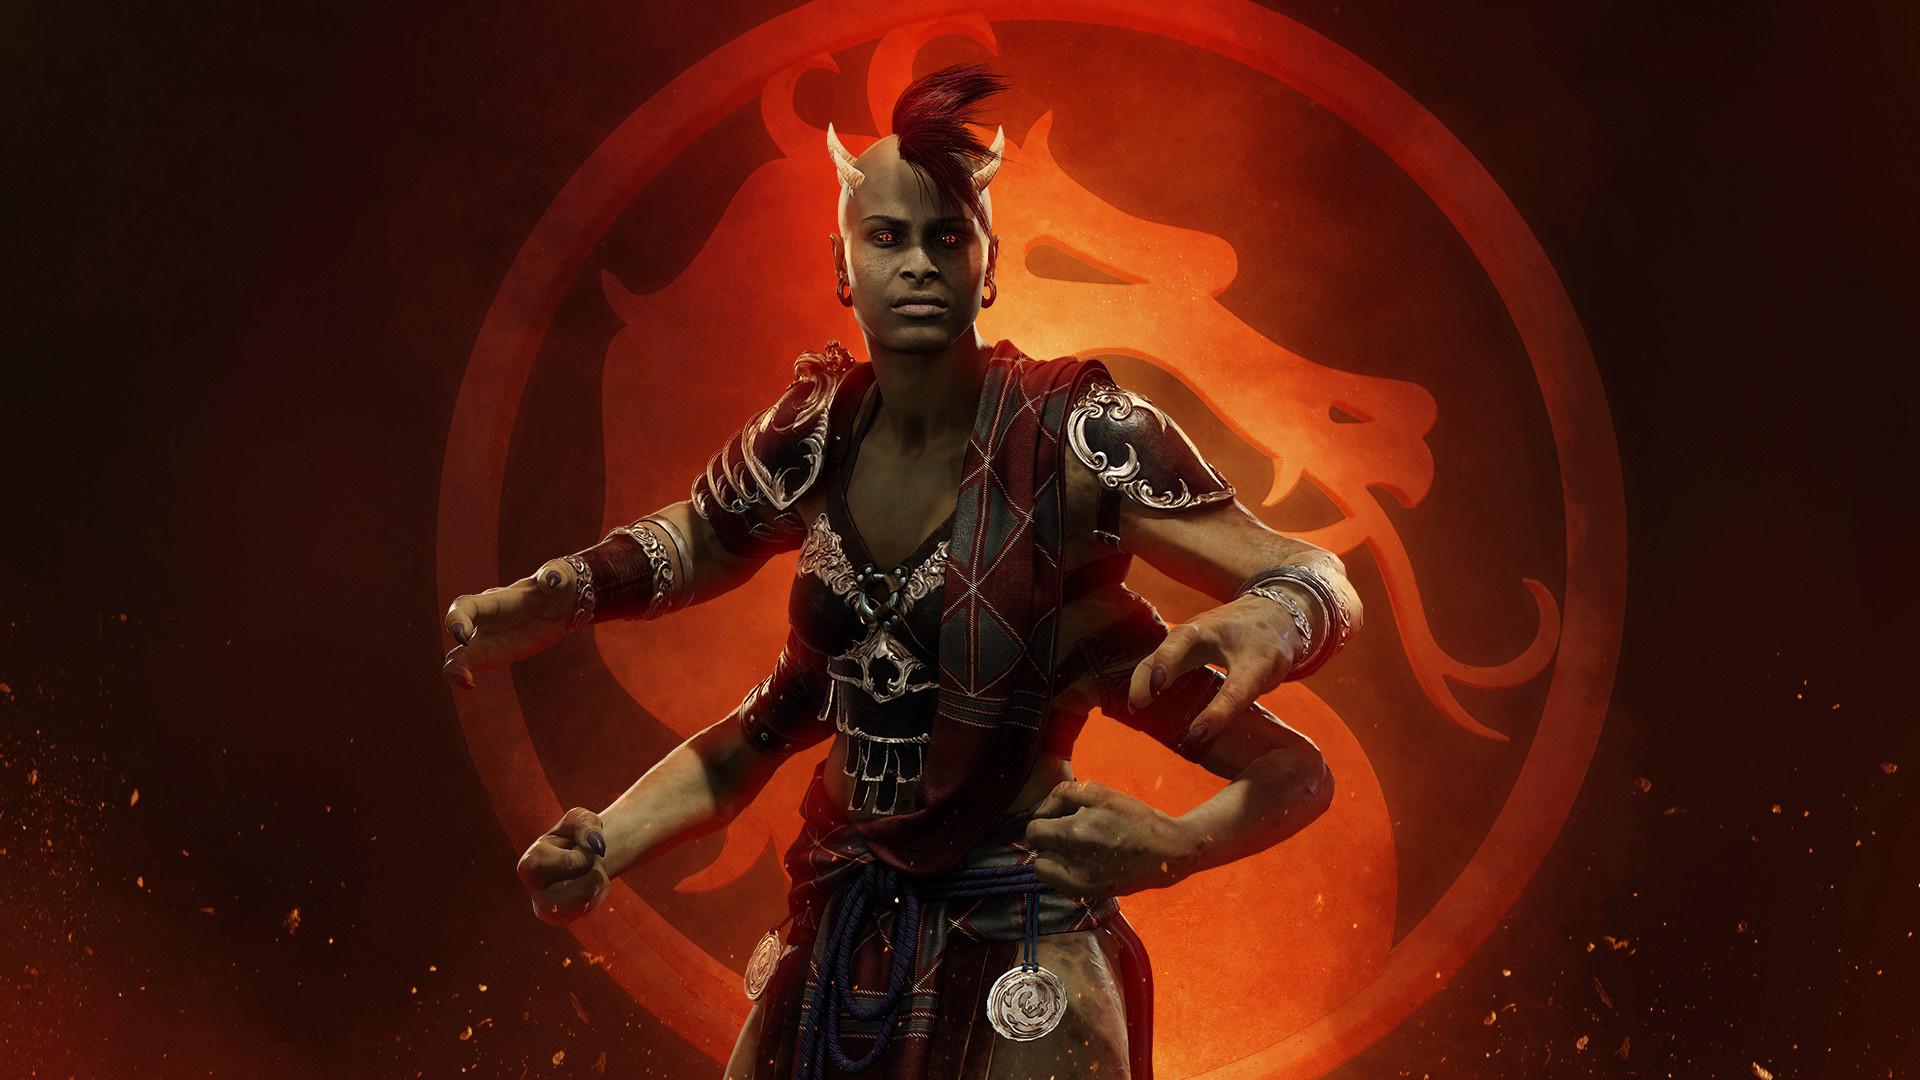 Игрока дисквалифицировали с турнира по Mortal Kombat11 за критику разработчиков